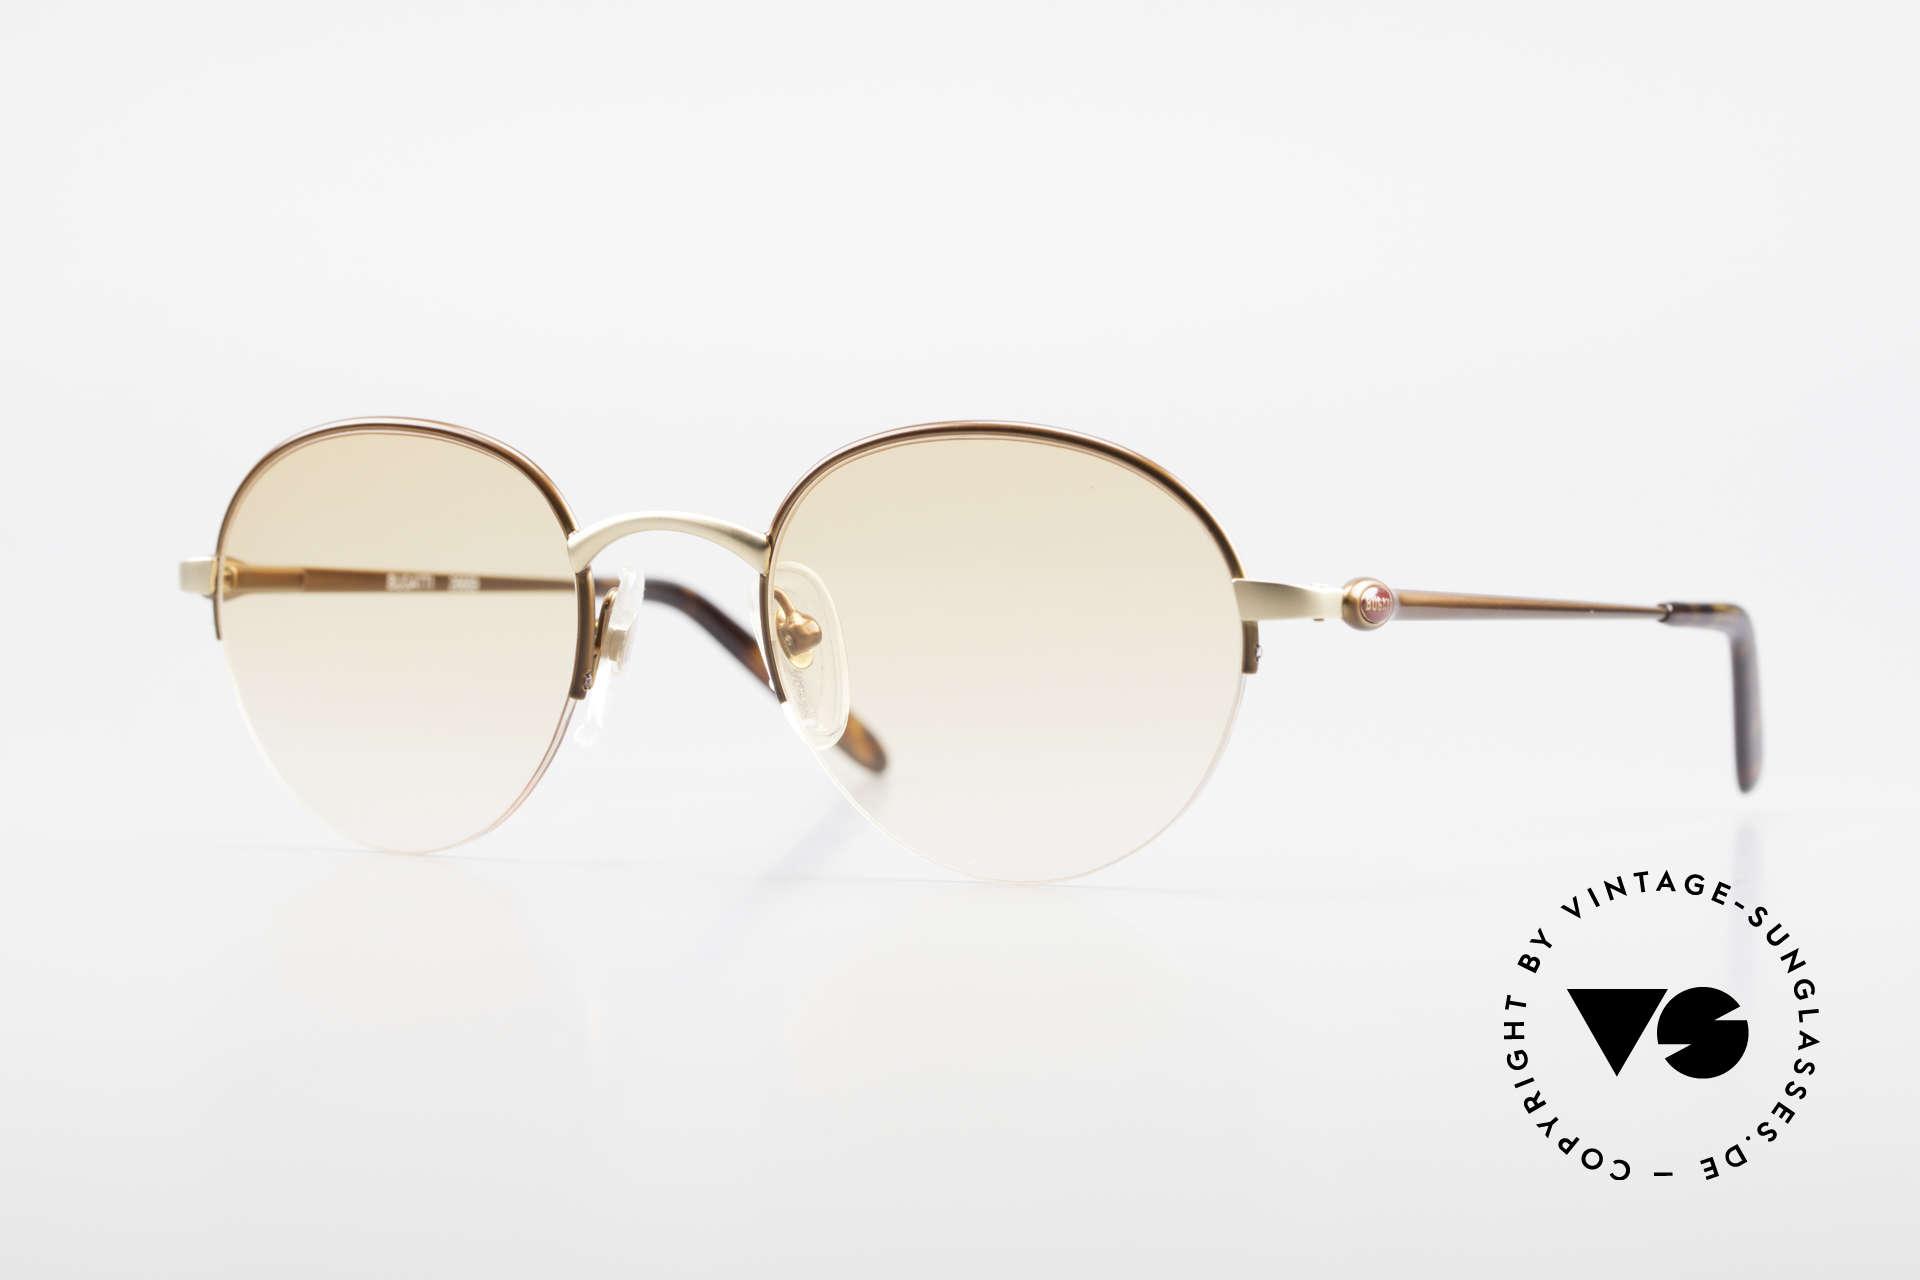 Bugatti 26669 Seltene Bugatti Panto Brille, seltene Bugatti Panto-Sonnenbrille; Gr. 49-21, Passend für Herren